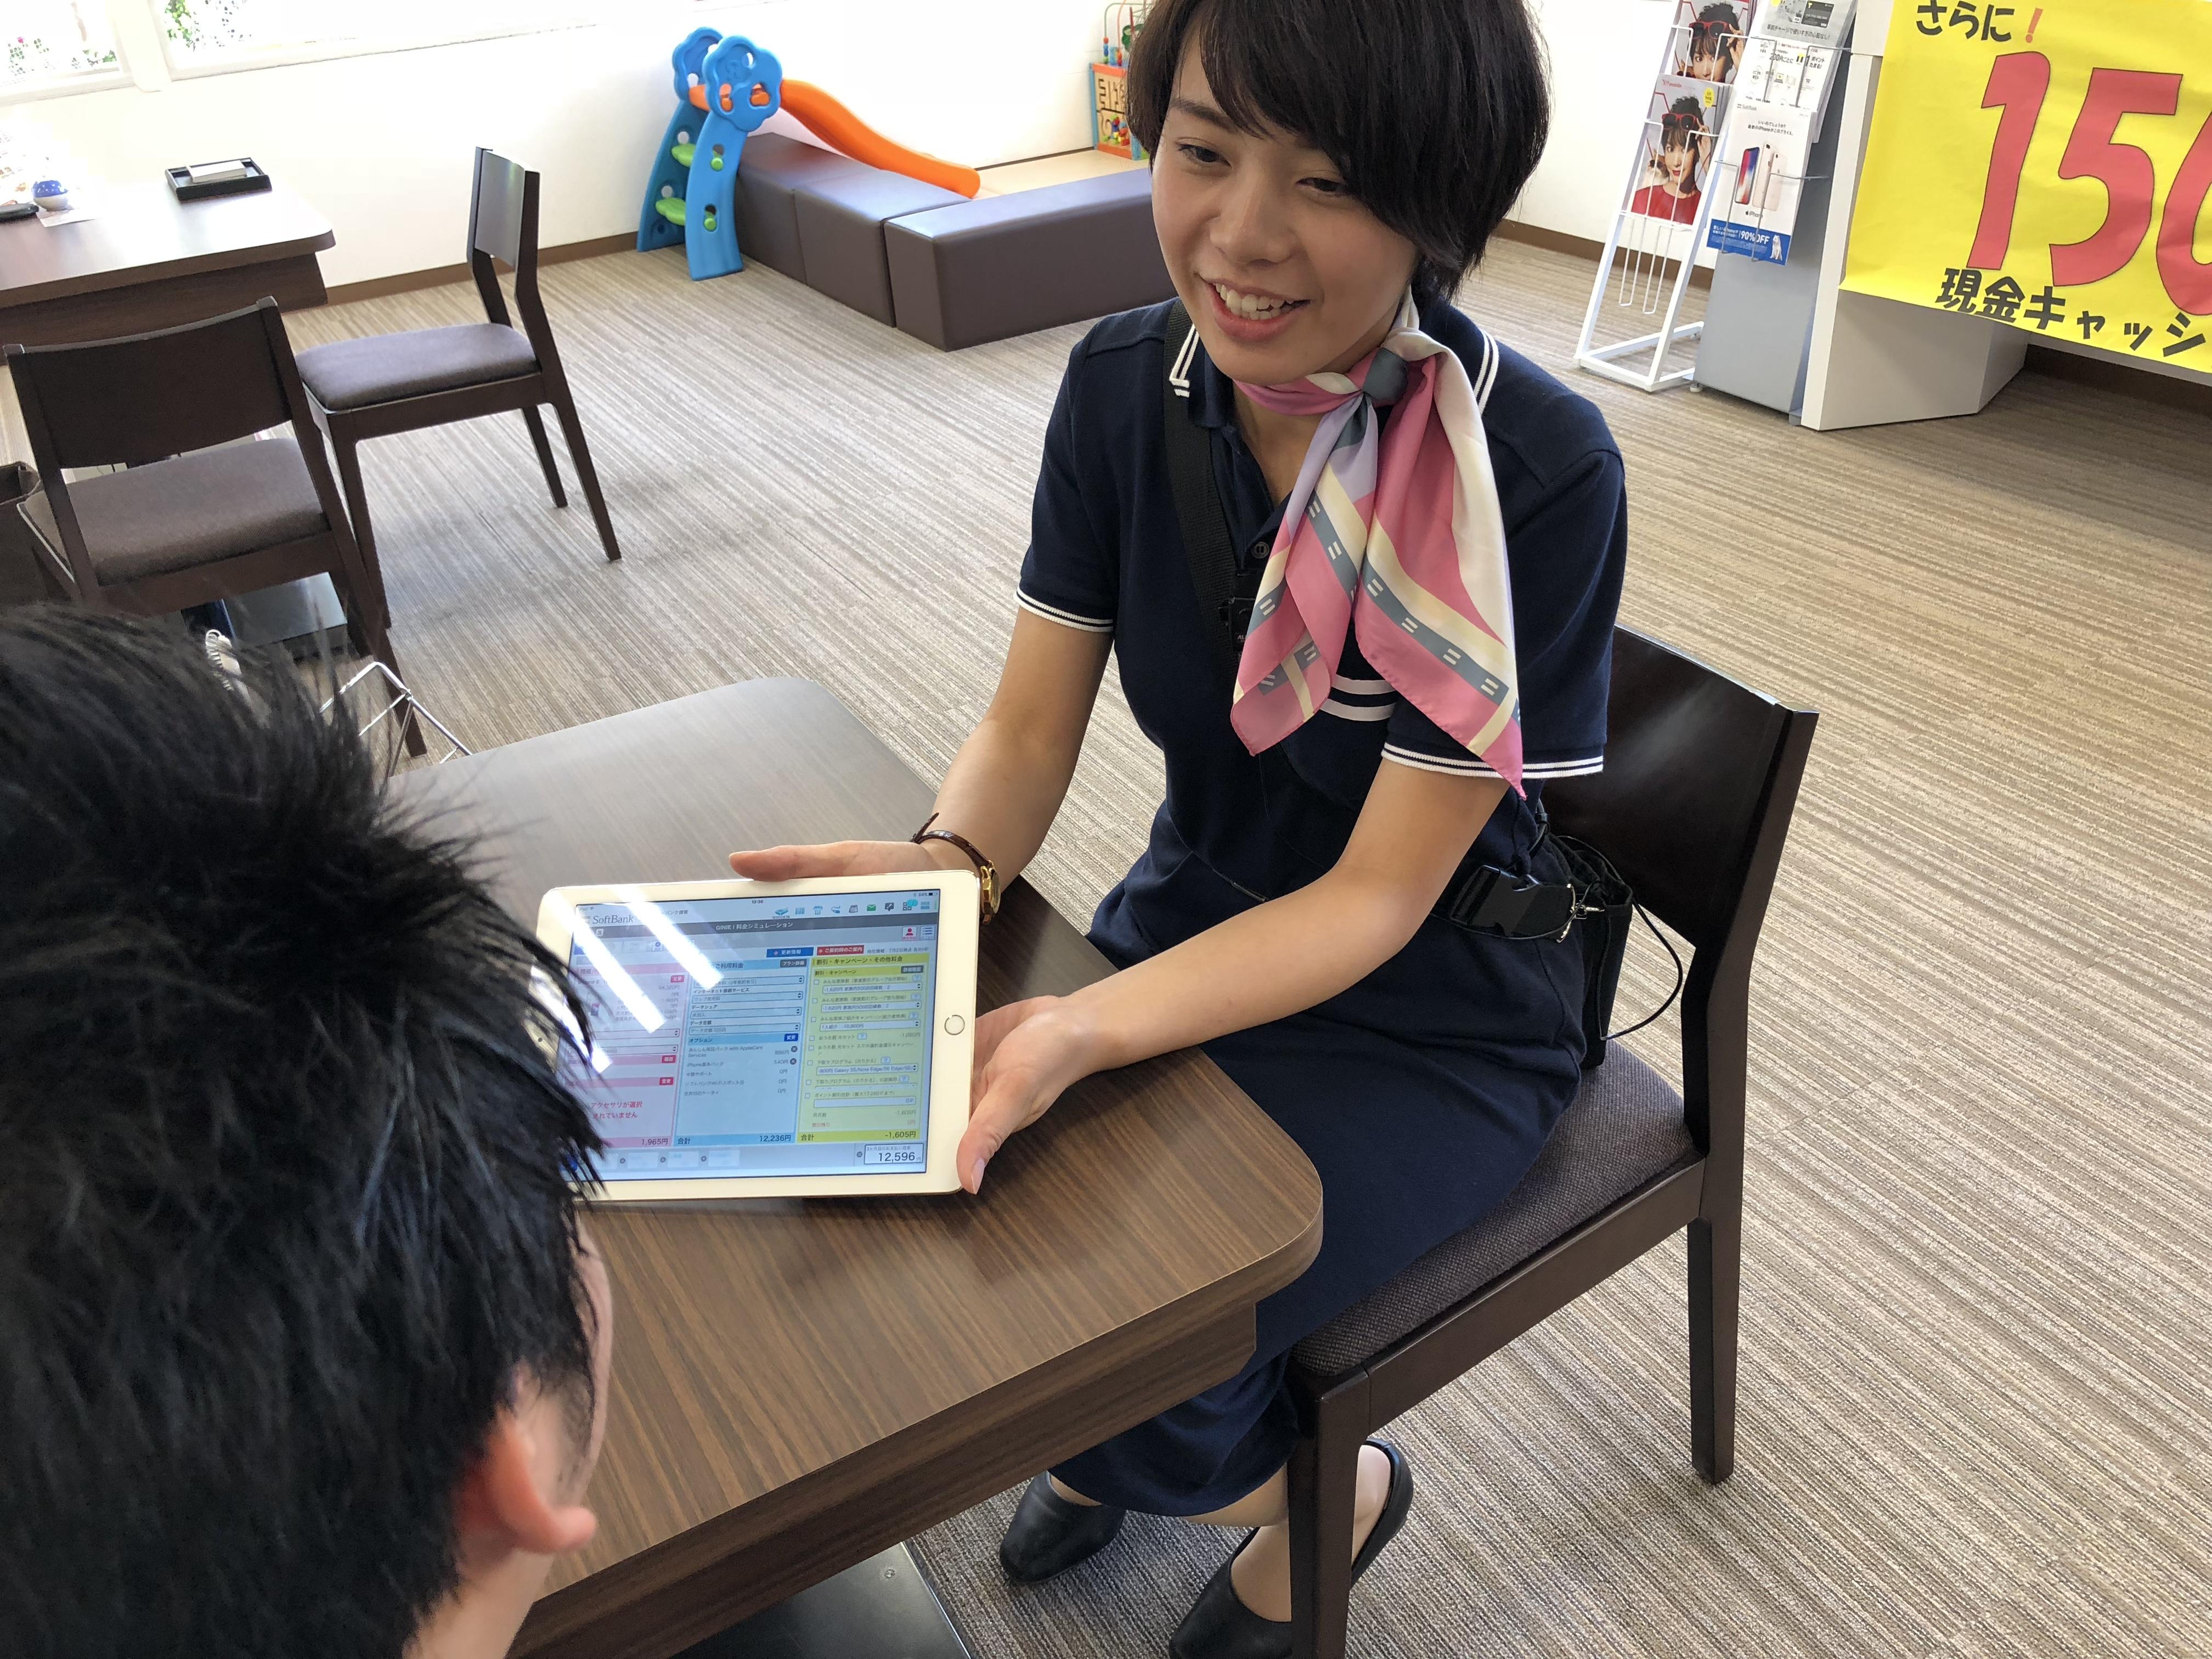 Soft Bank 健軍店  接客スタッフ アルバイト